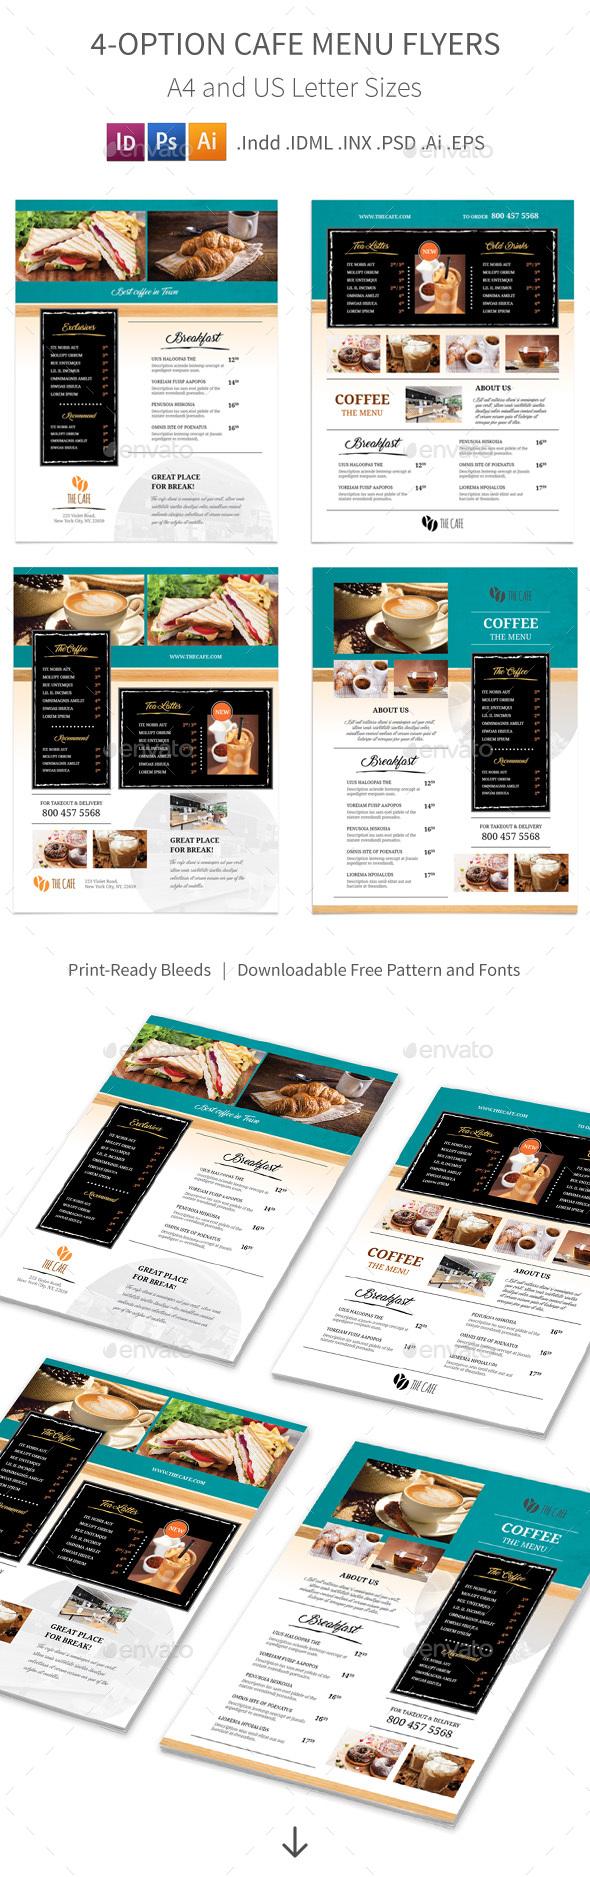 Cafe Menu Flyers 2 – 4 Options